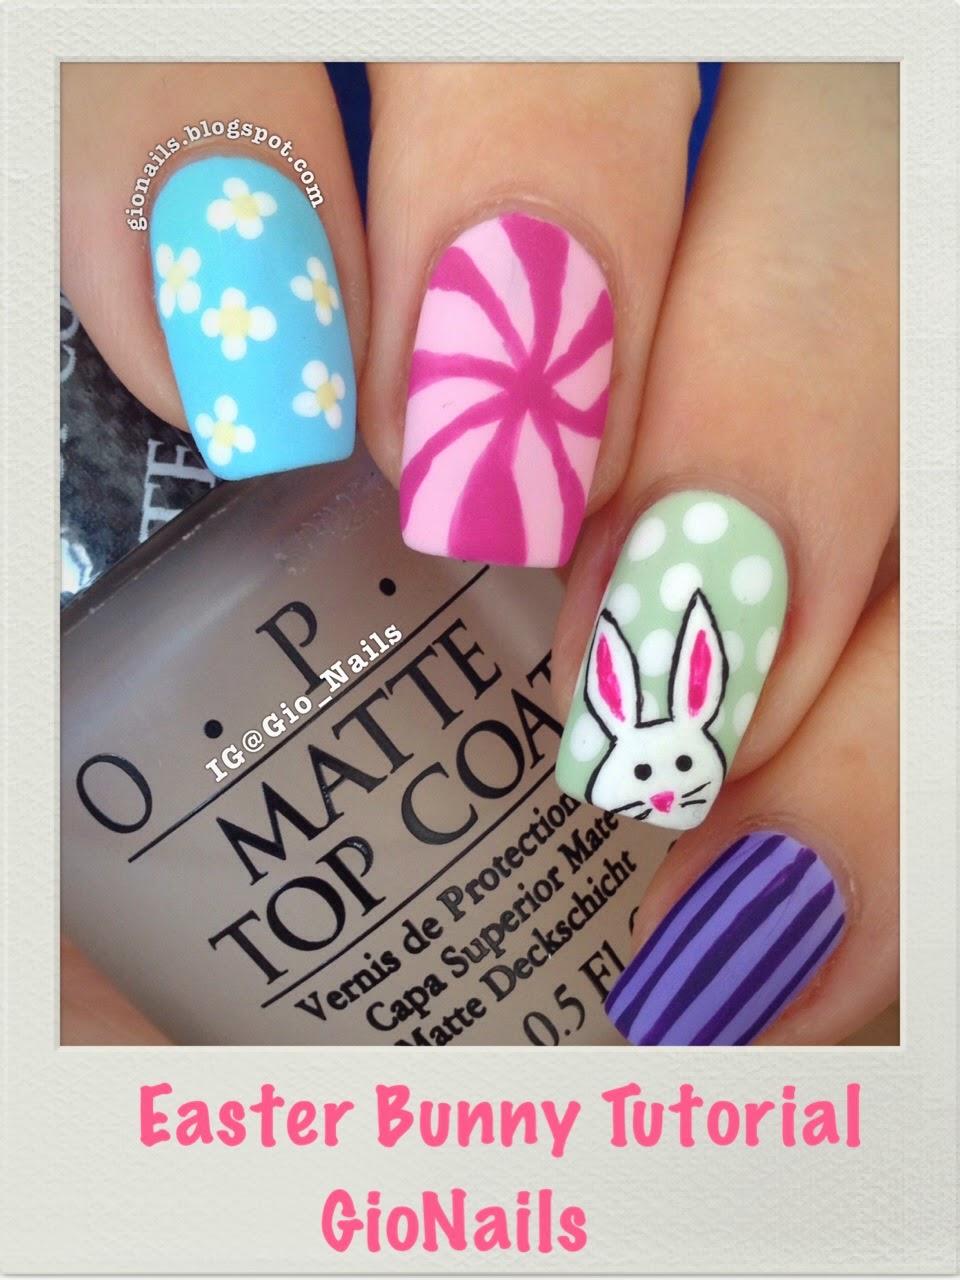 http://gionails.blogspot.be/2014/04/easter-bunny-tutorial.html